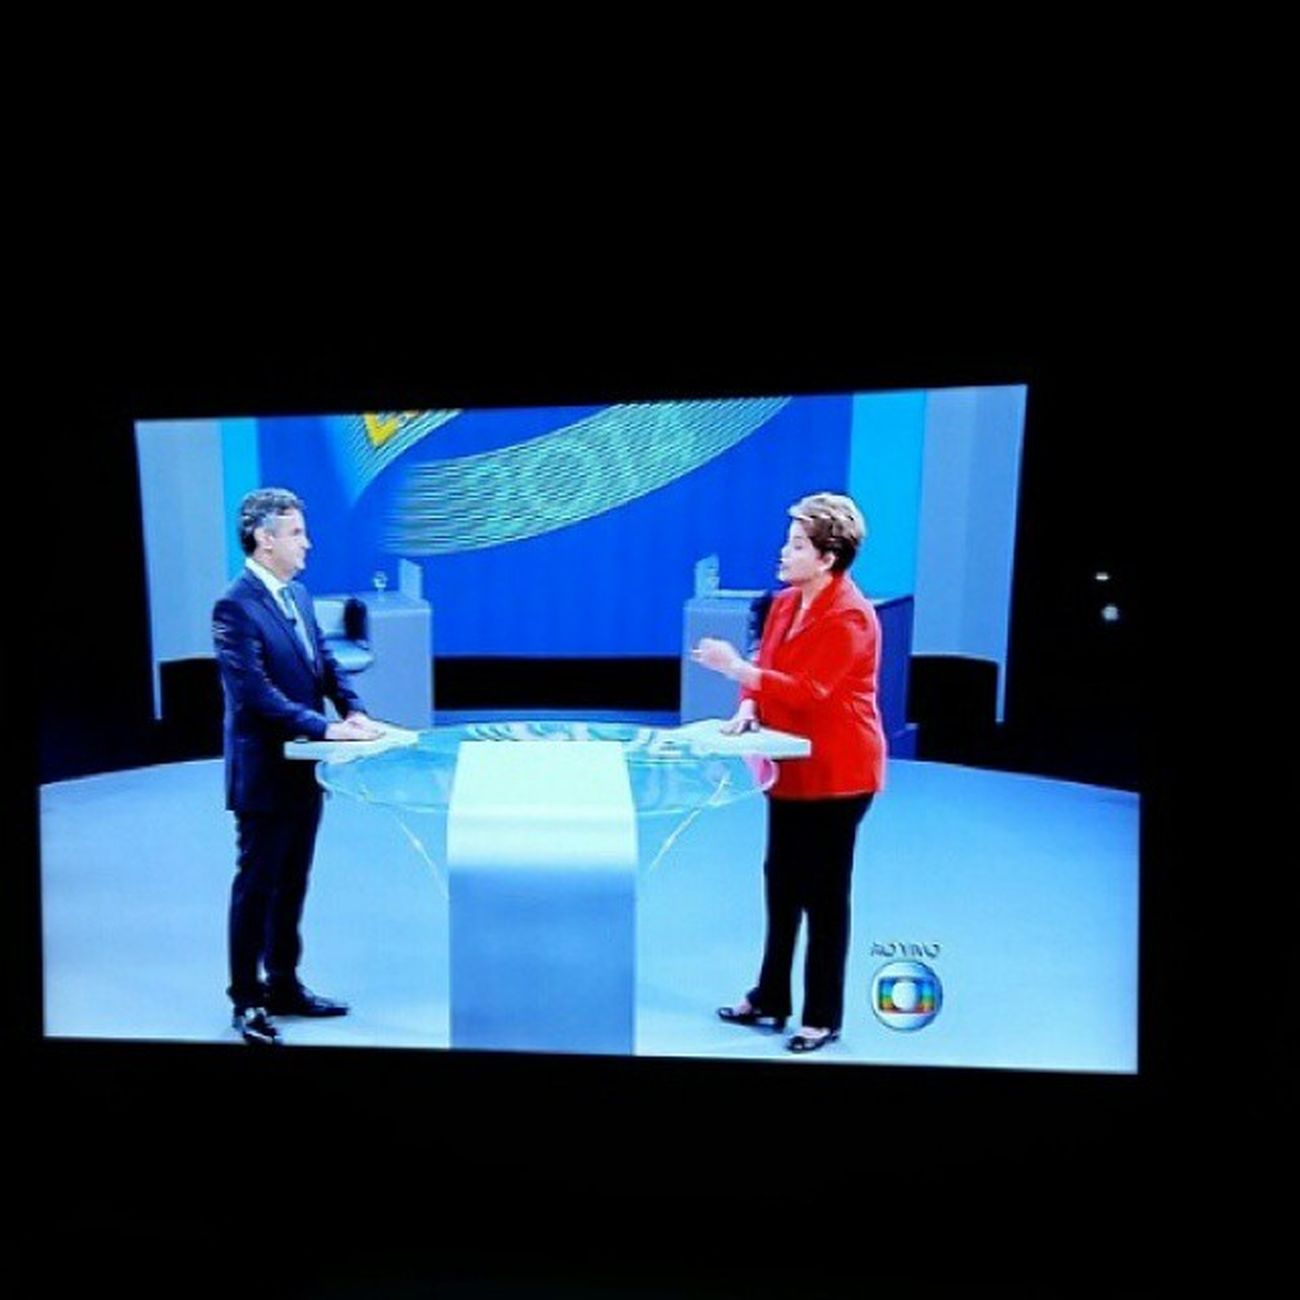 1⃣ 3⃣ Dilma13 Votecomconsciencia Porumbrasilmelhor